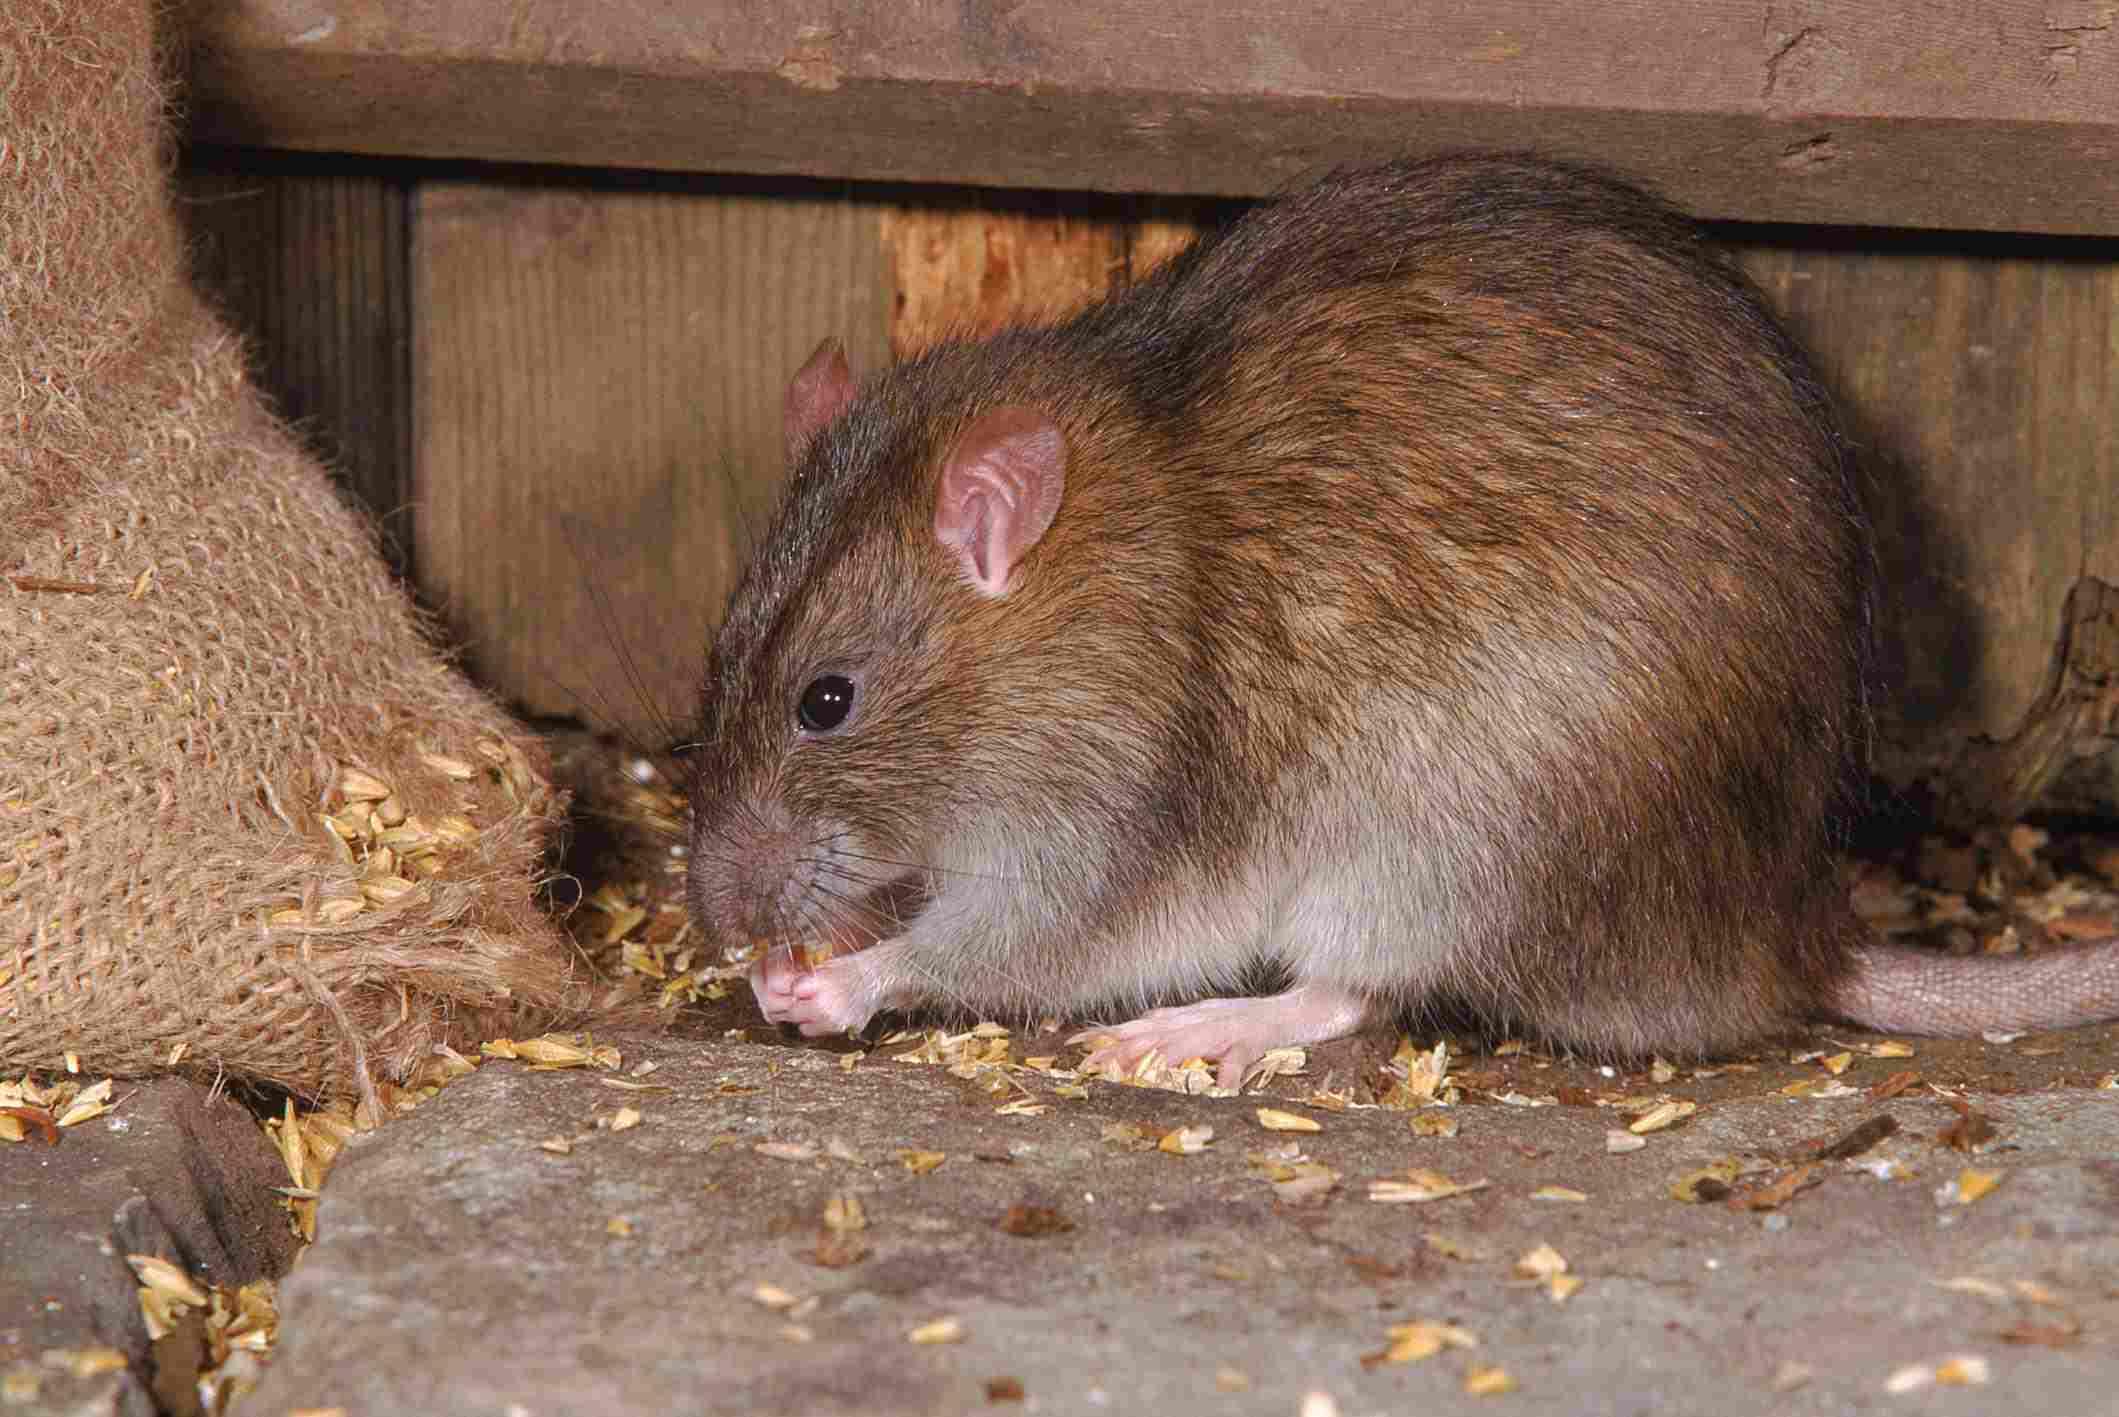 Brown Rat Eating Grain in a Barn